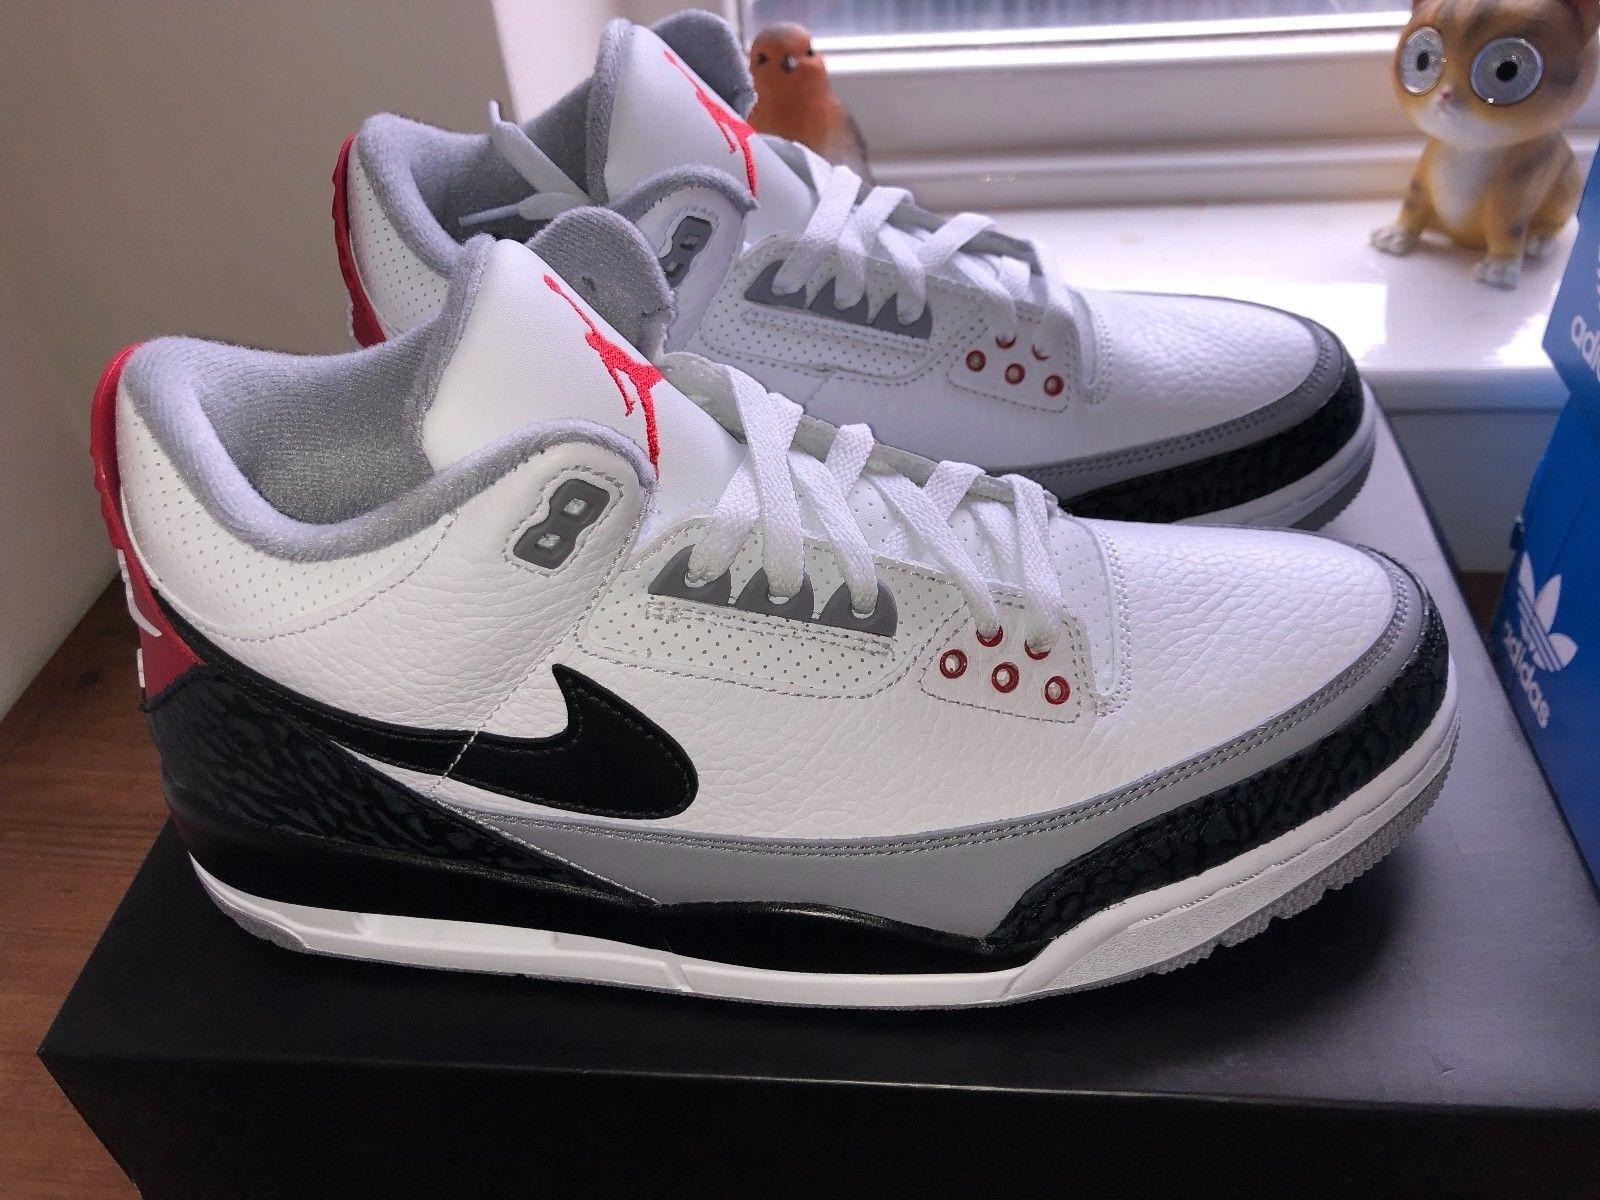 Nike Air Jordan 3 Limited Tinker NRG UK10 US11